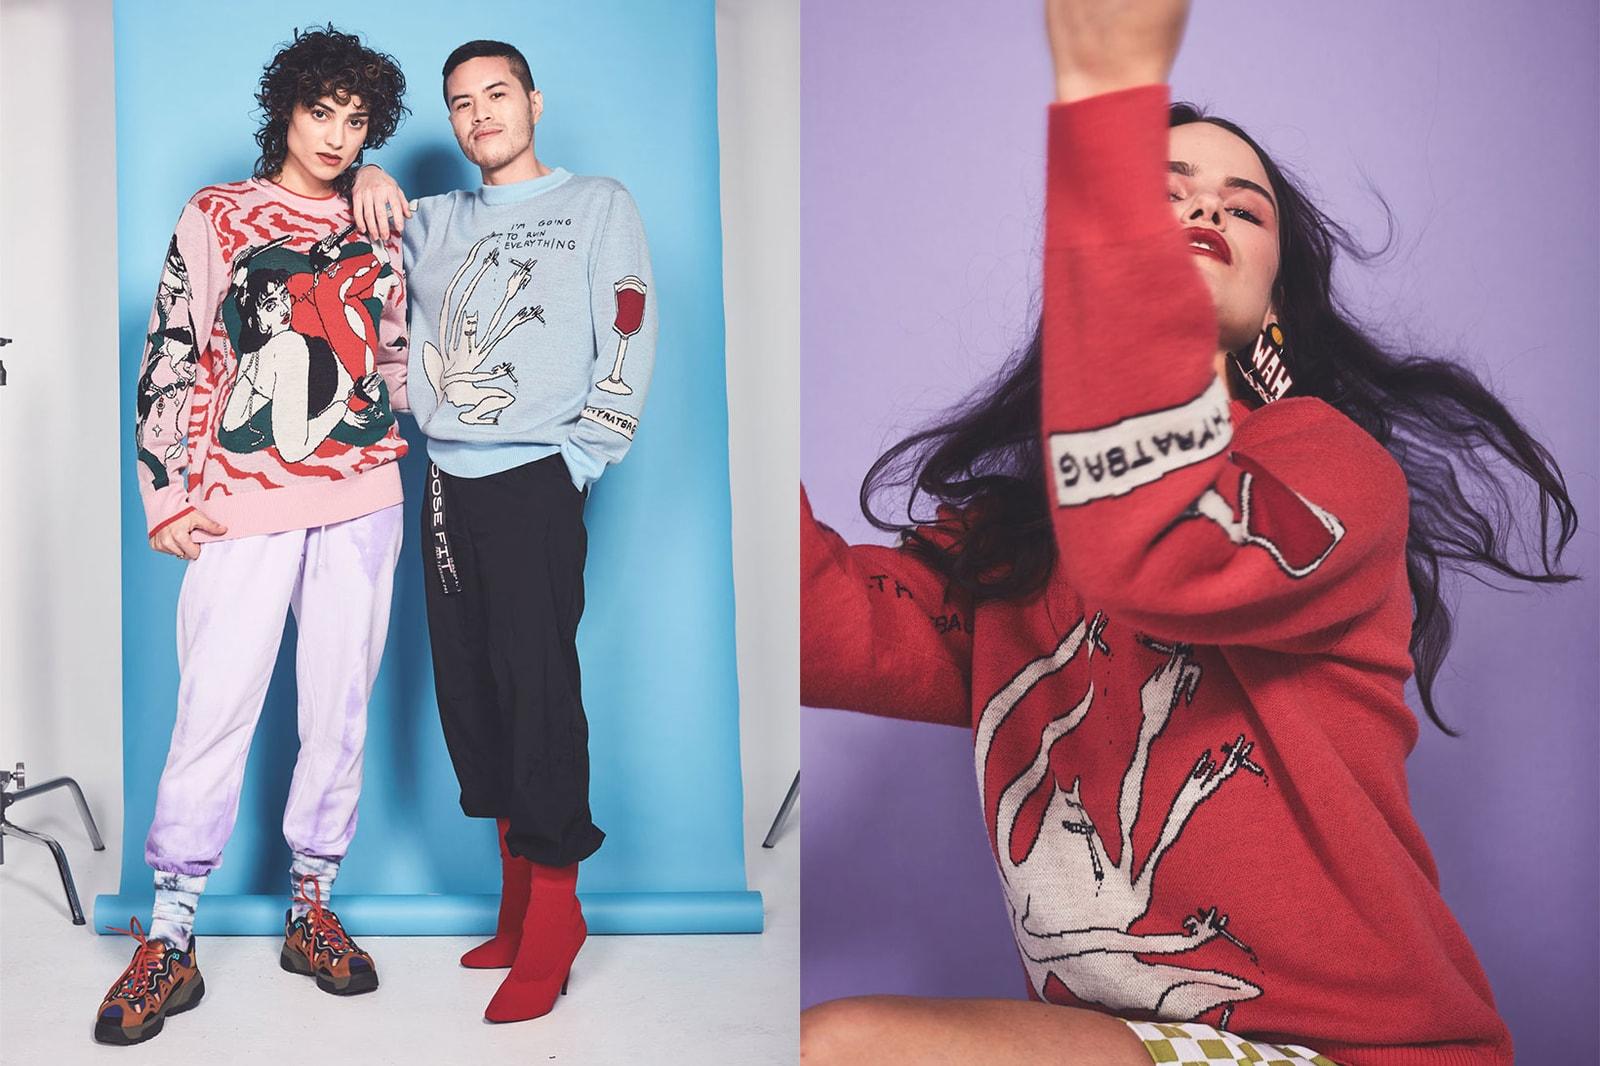 best sustainable eco-friendly knitwear brands sweaters cardigans wah-wah australia